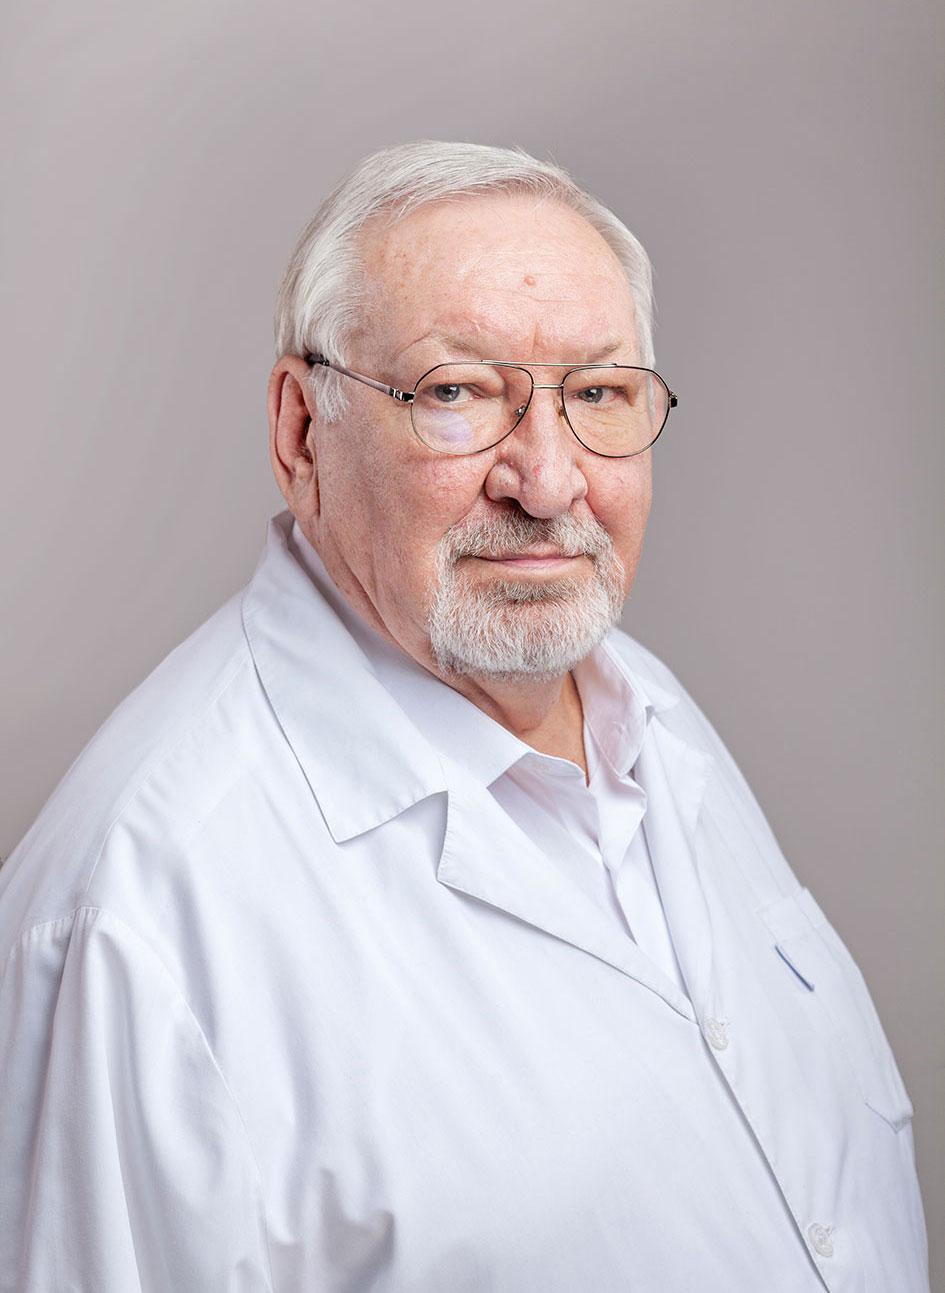 Шкуро Анатолий Георгиевич